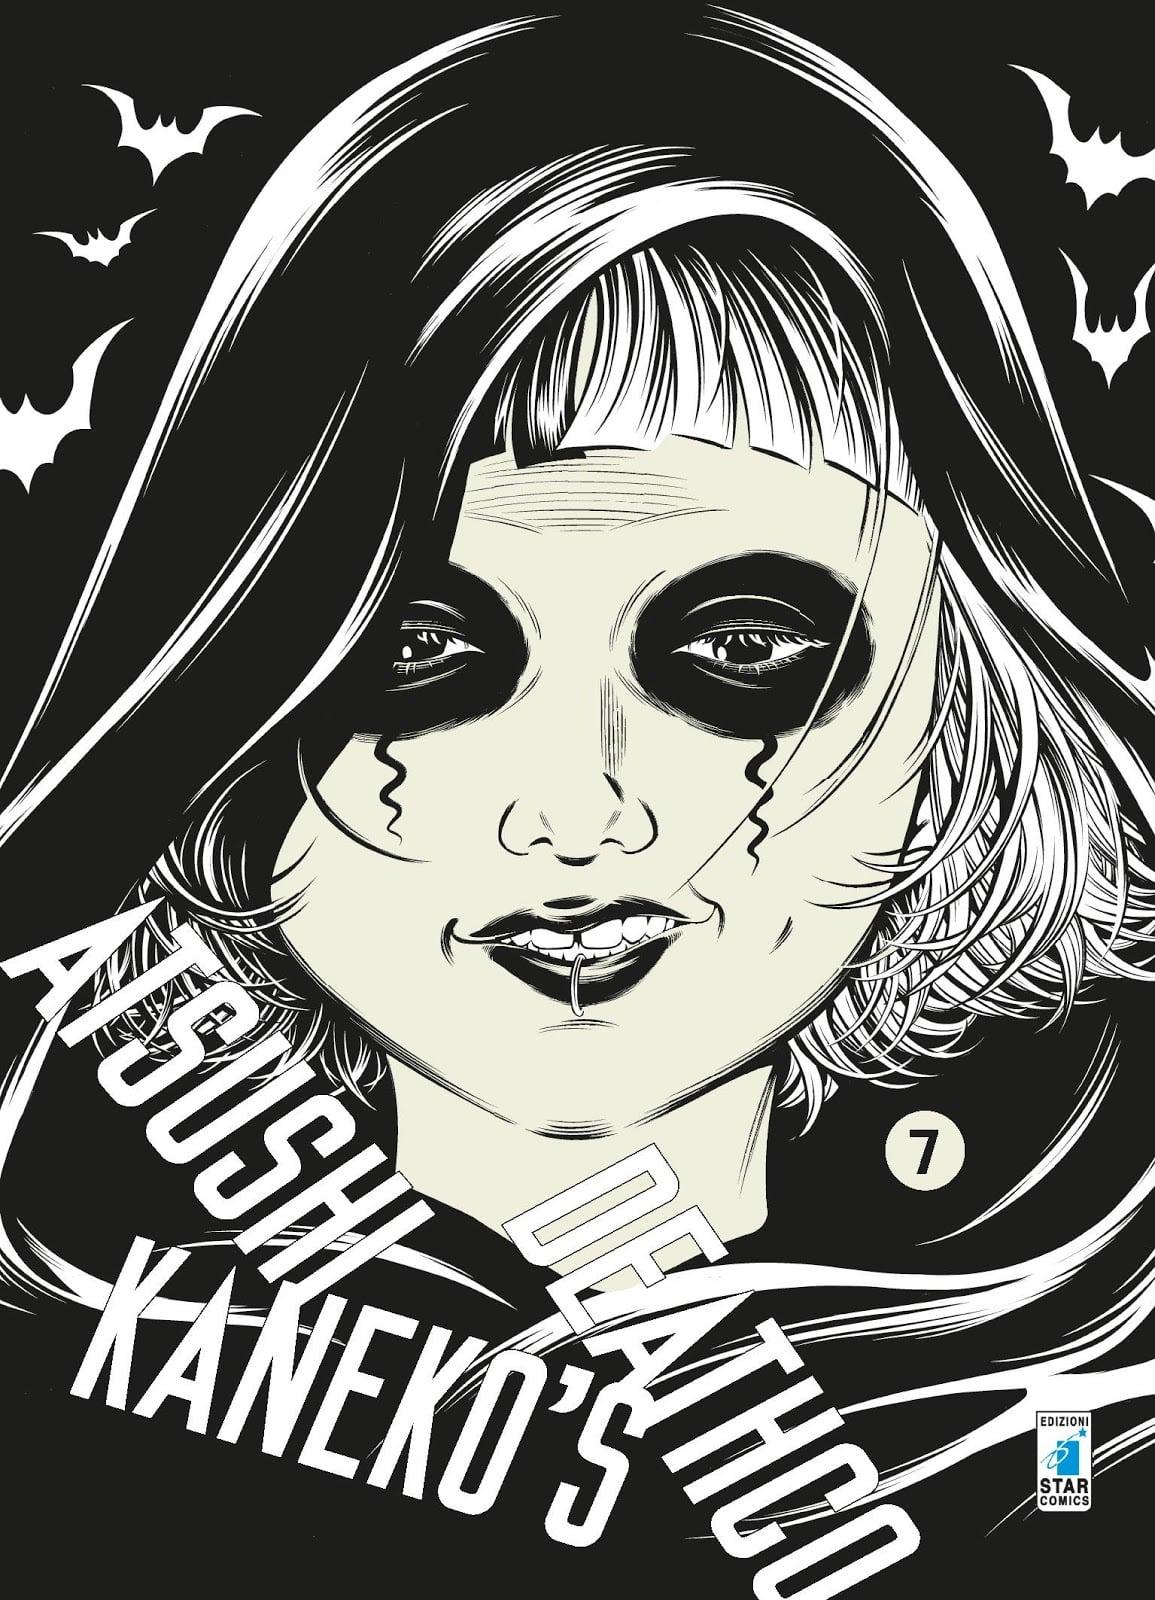 Giunge a conclusione Deathco, manga di Atsushi Kaneko